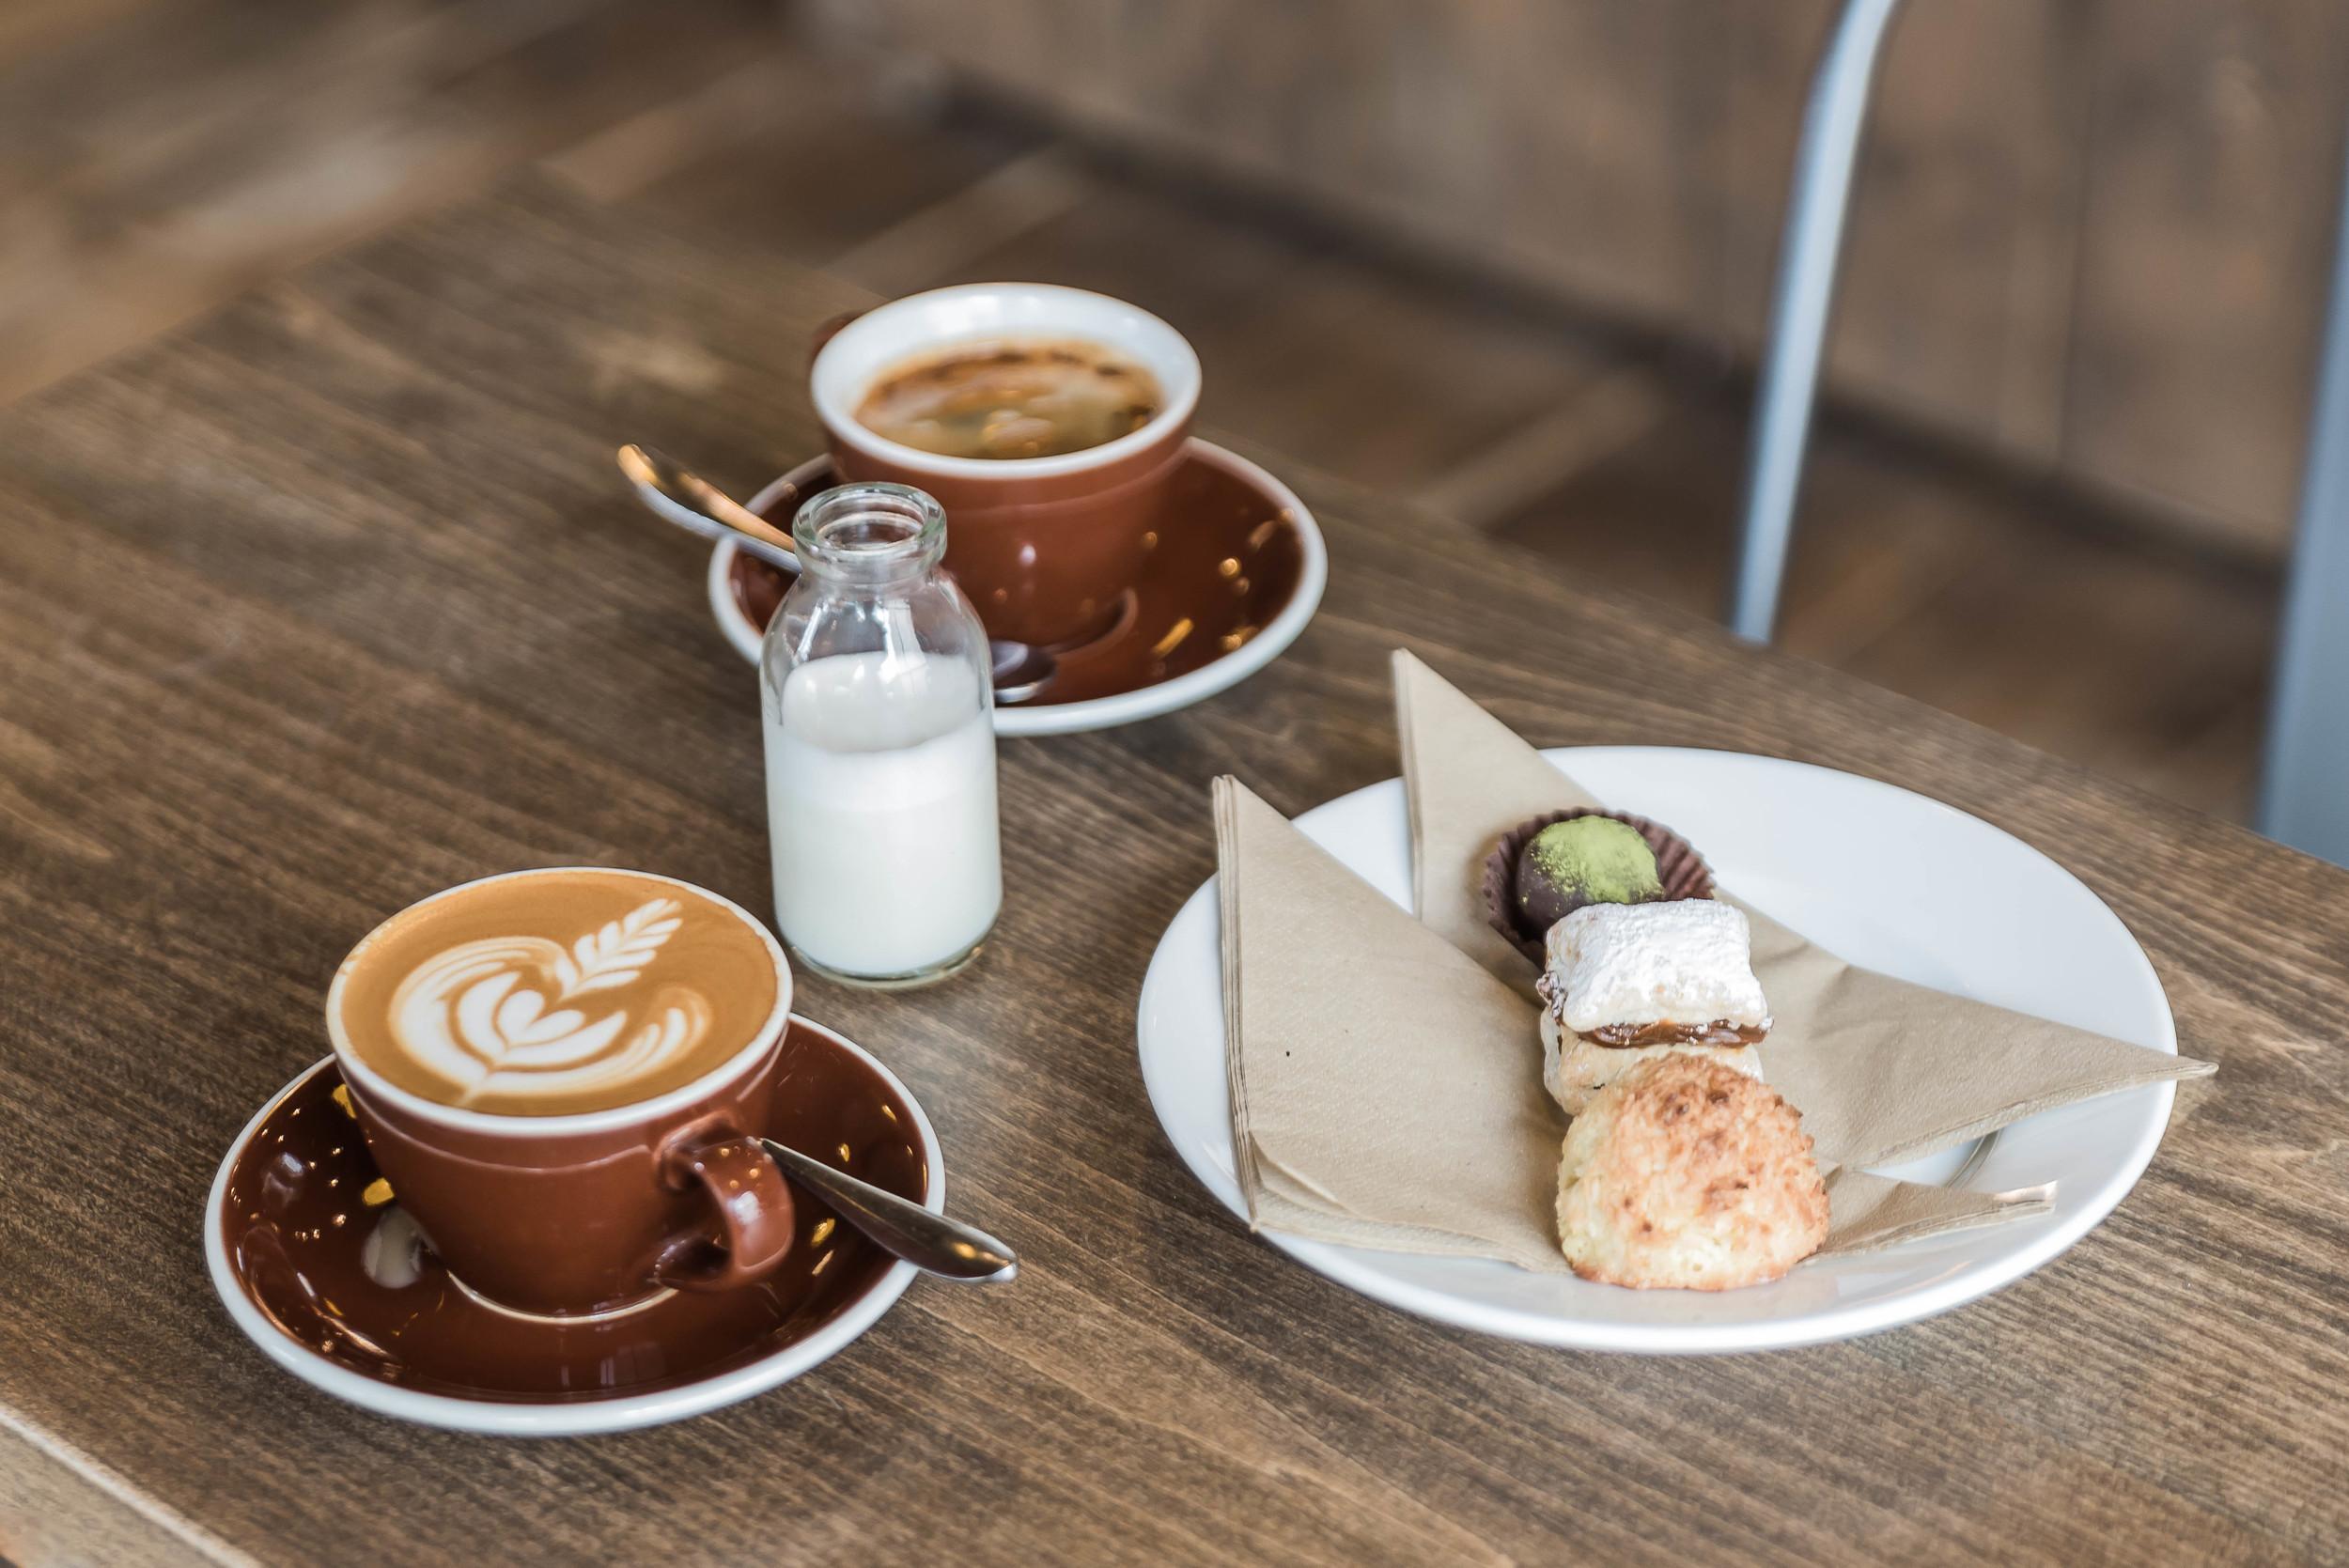 TAMP coffee - Flat white